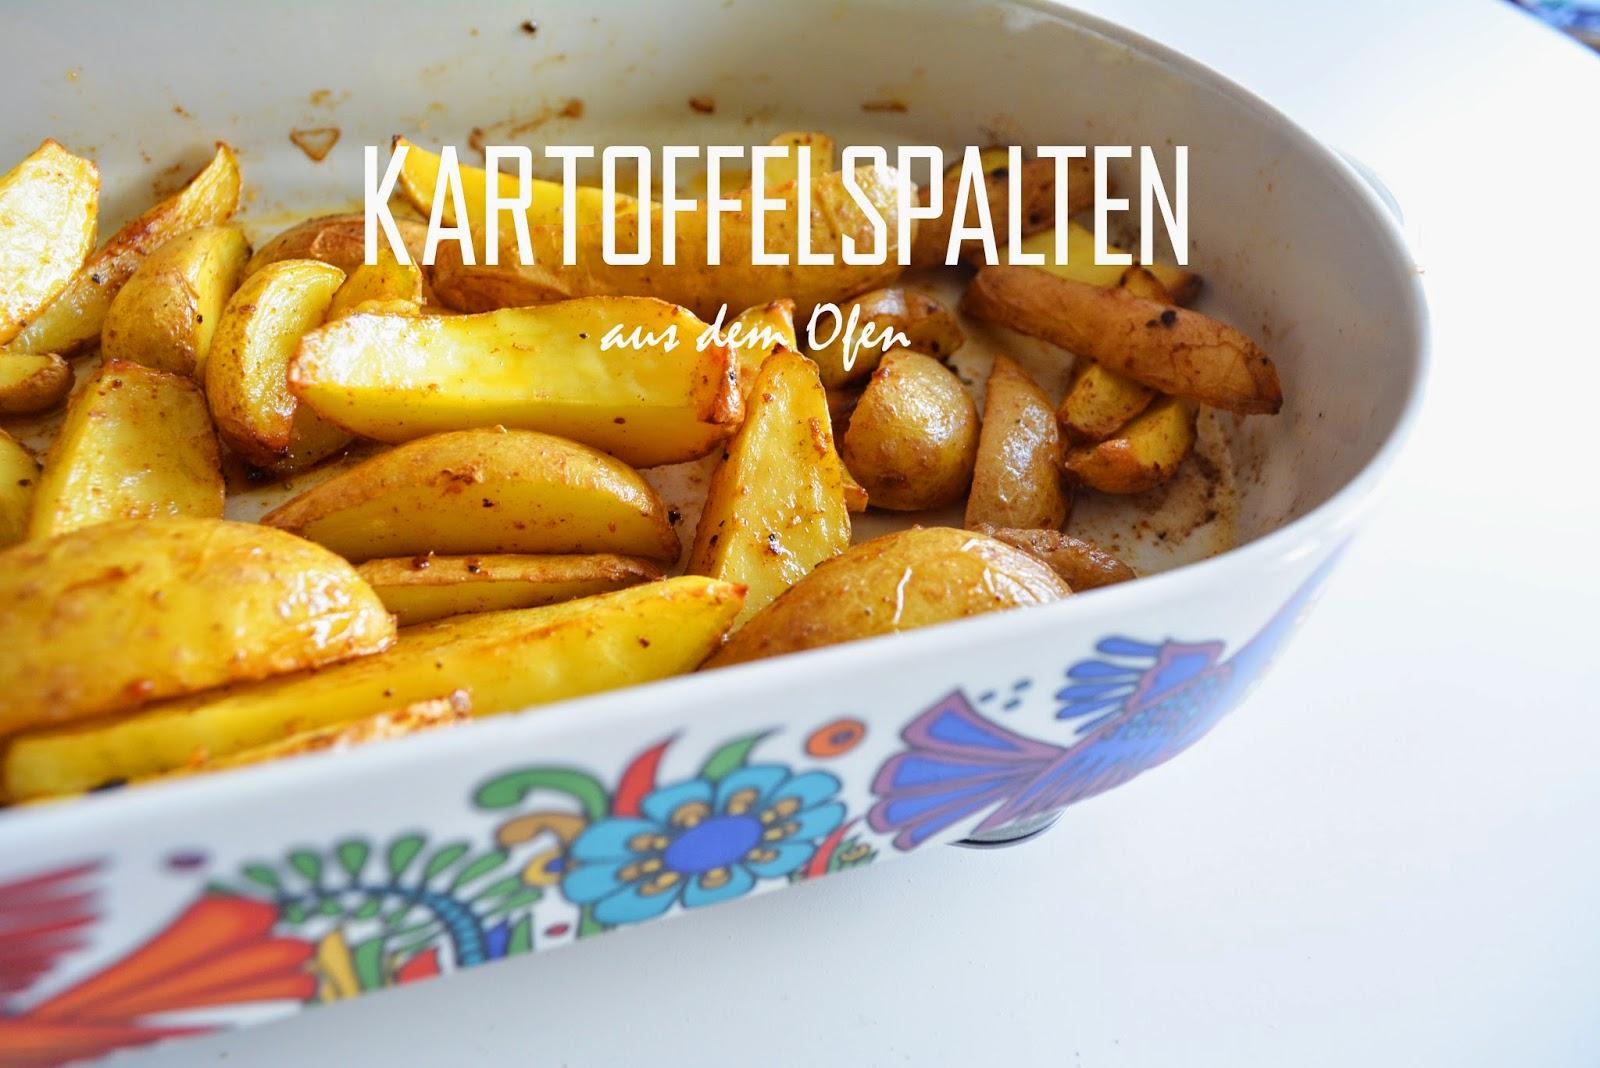 http://pia-malagala.blogspot.de/2014/08/easy-peasy-kartoffelspalten-aus-dem-ofen.html